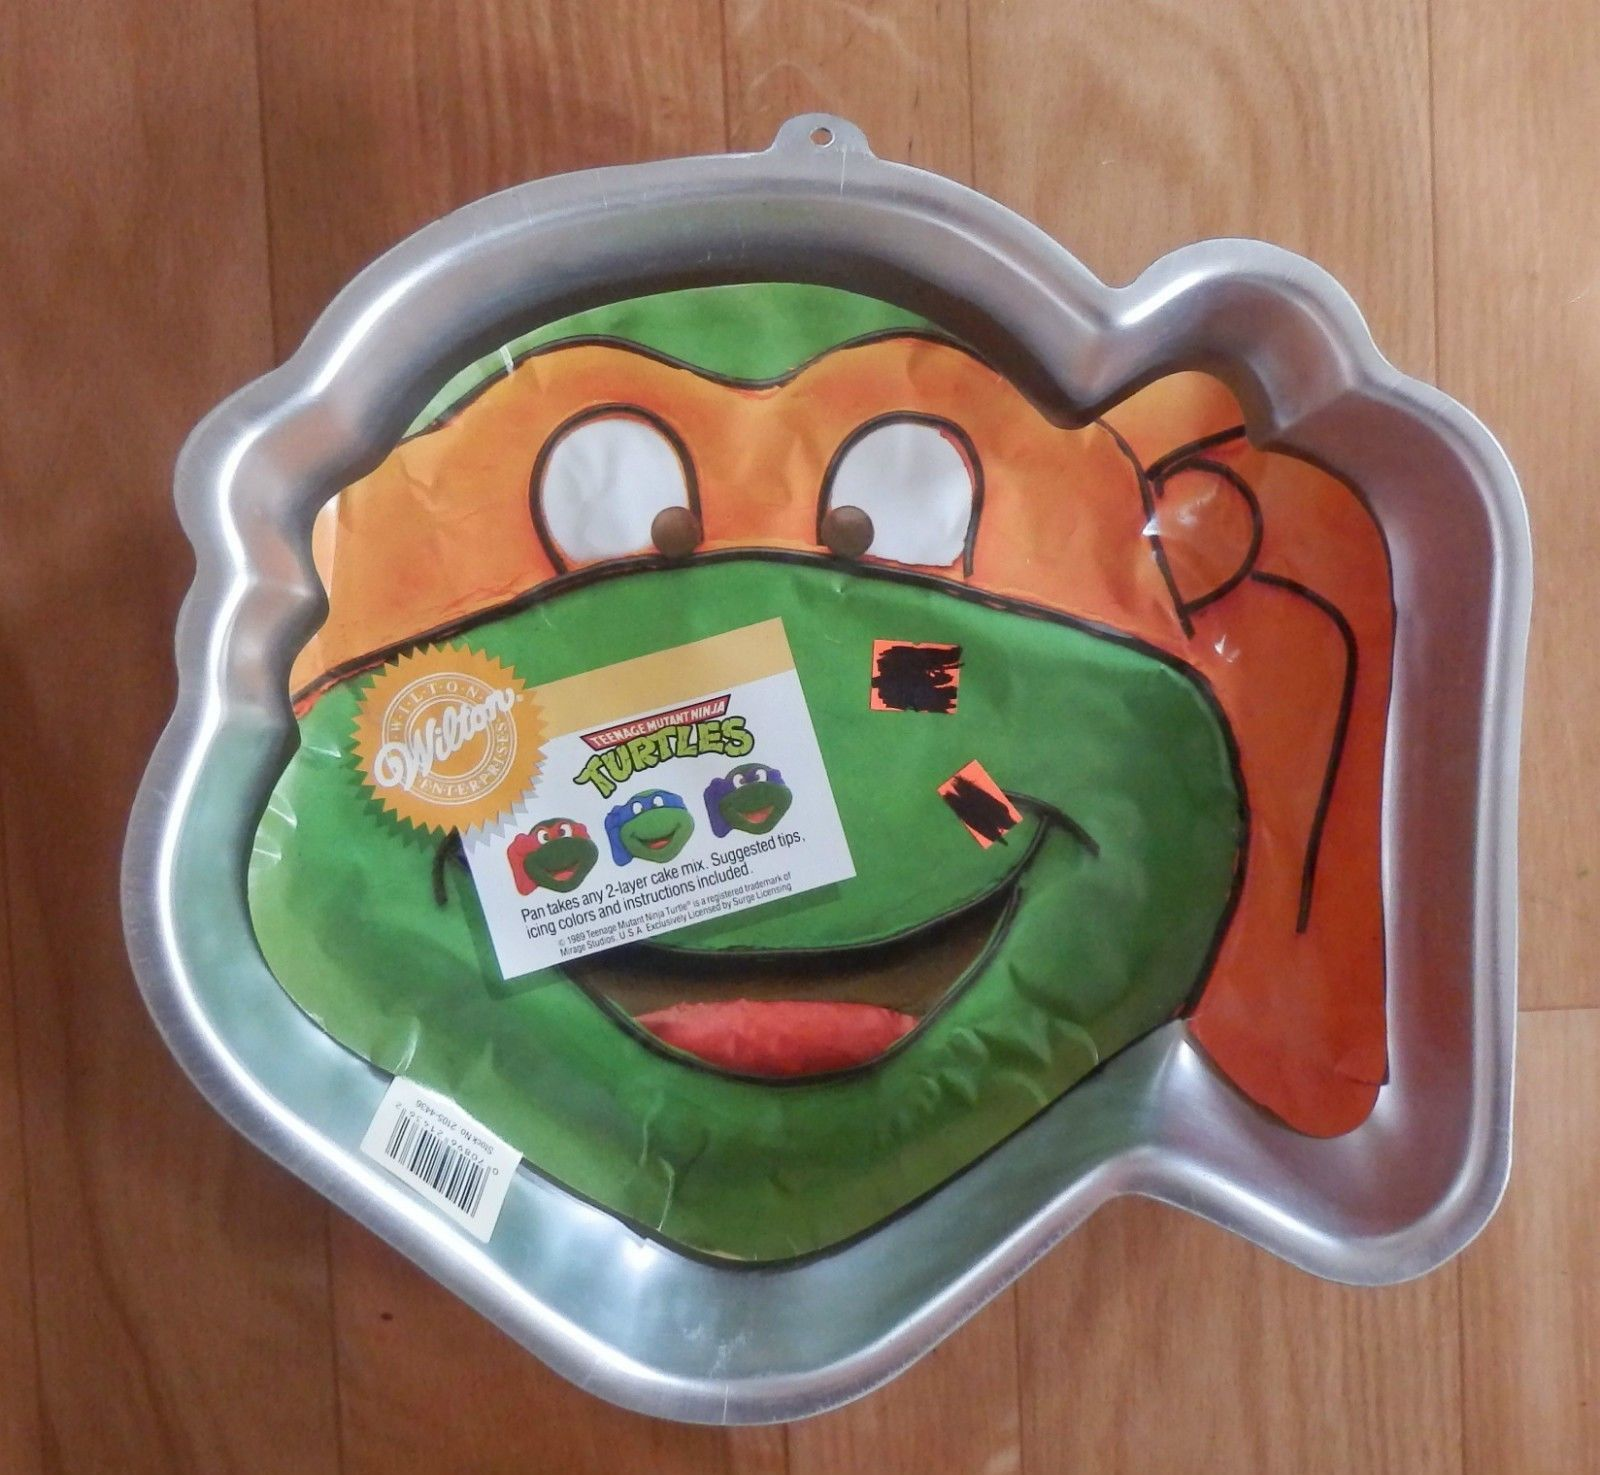 Cool Wilton Cake Pan Cakes Party Birthday Teenage Mutant Ninja Turtles Personalised Birthday Cards Petedlily Jamesorg